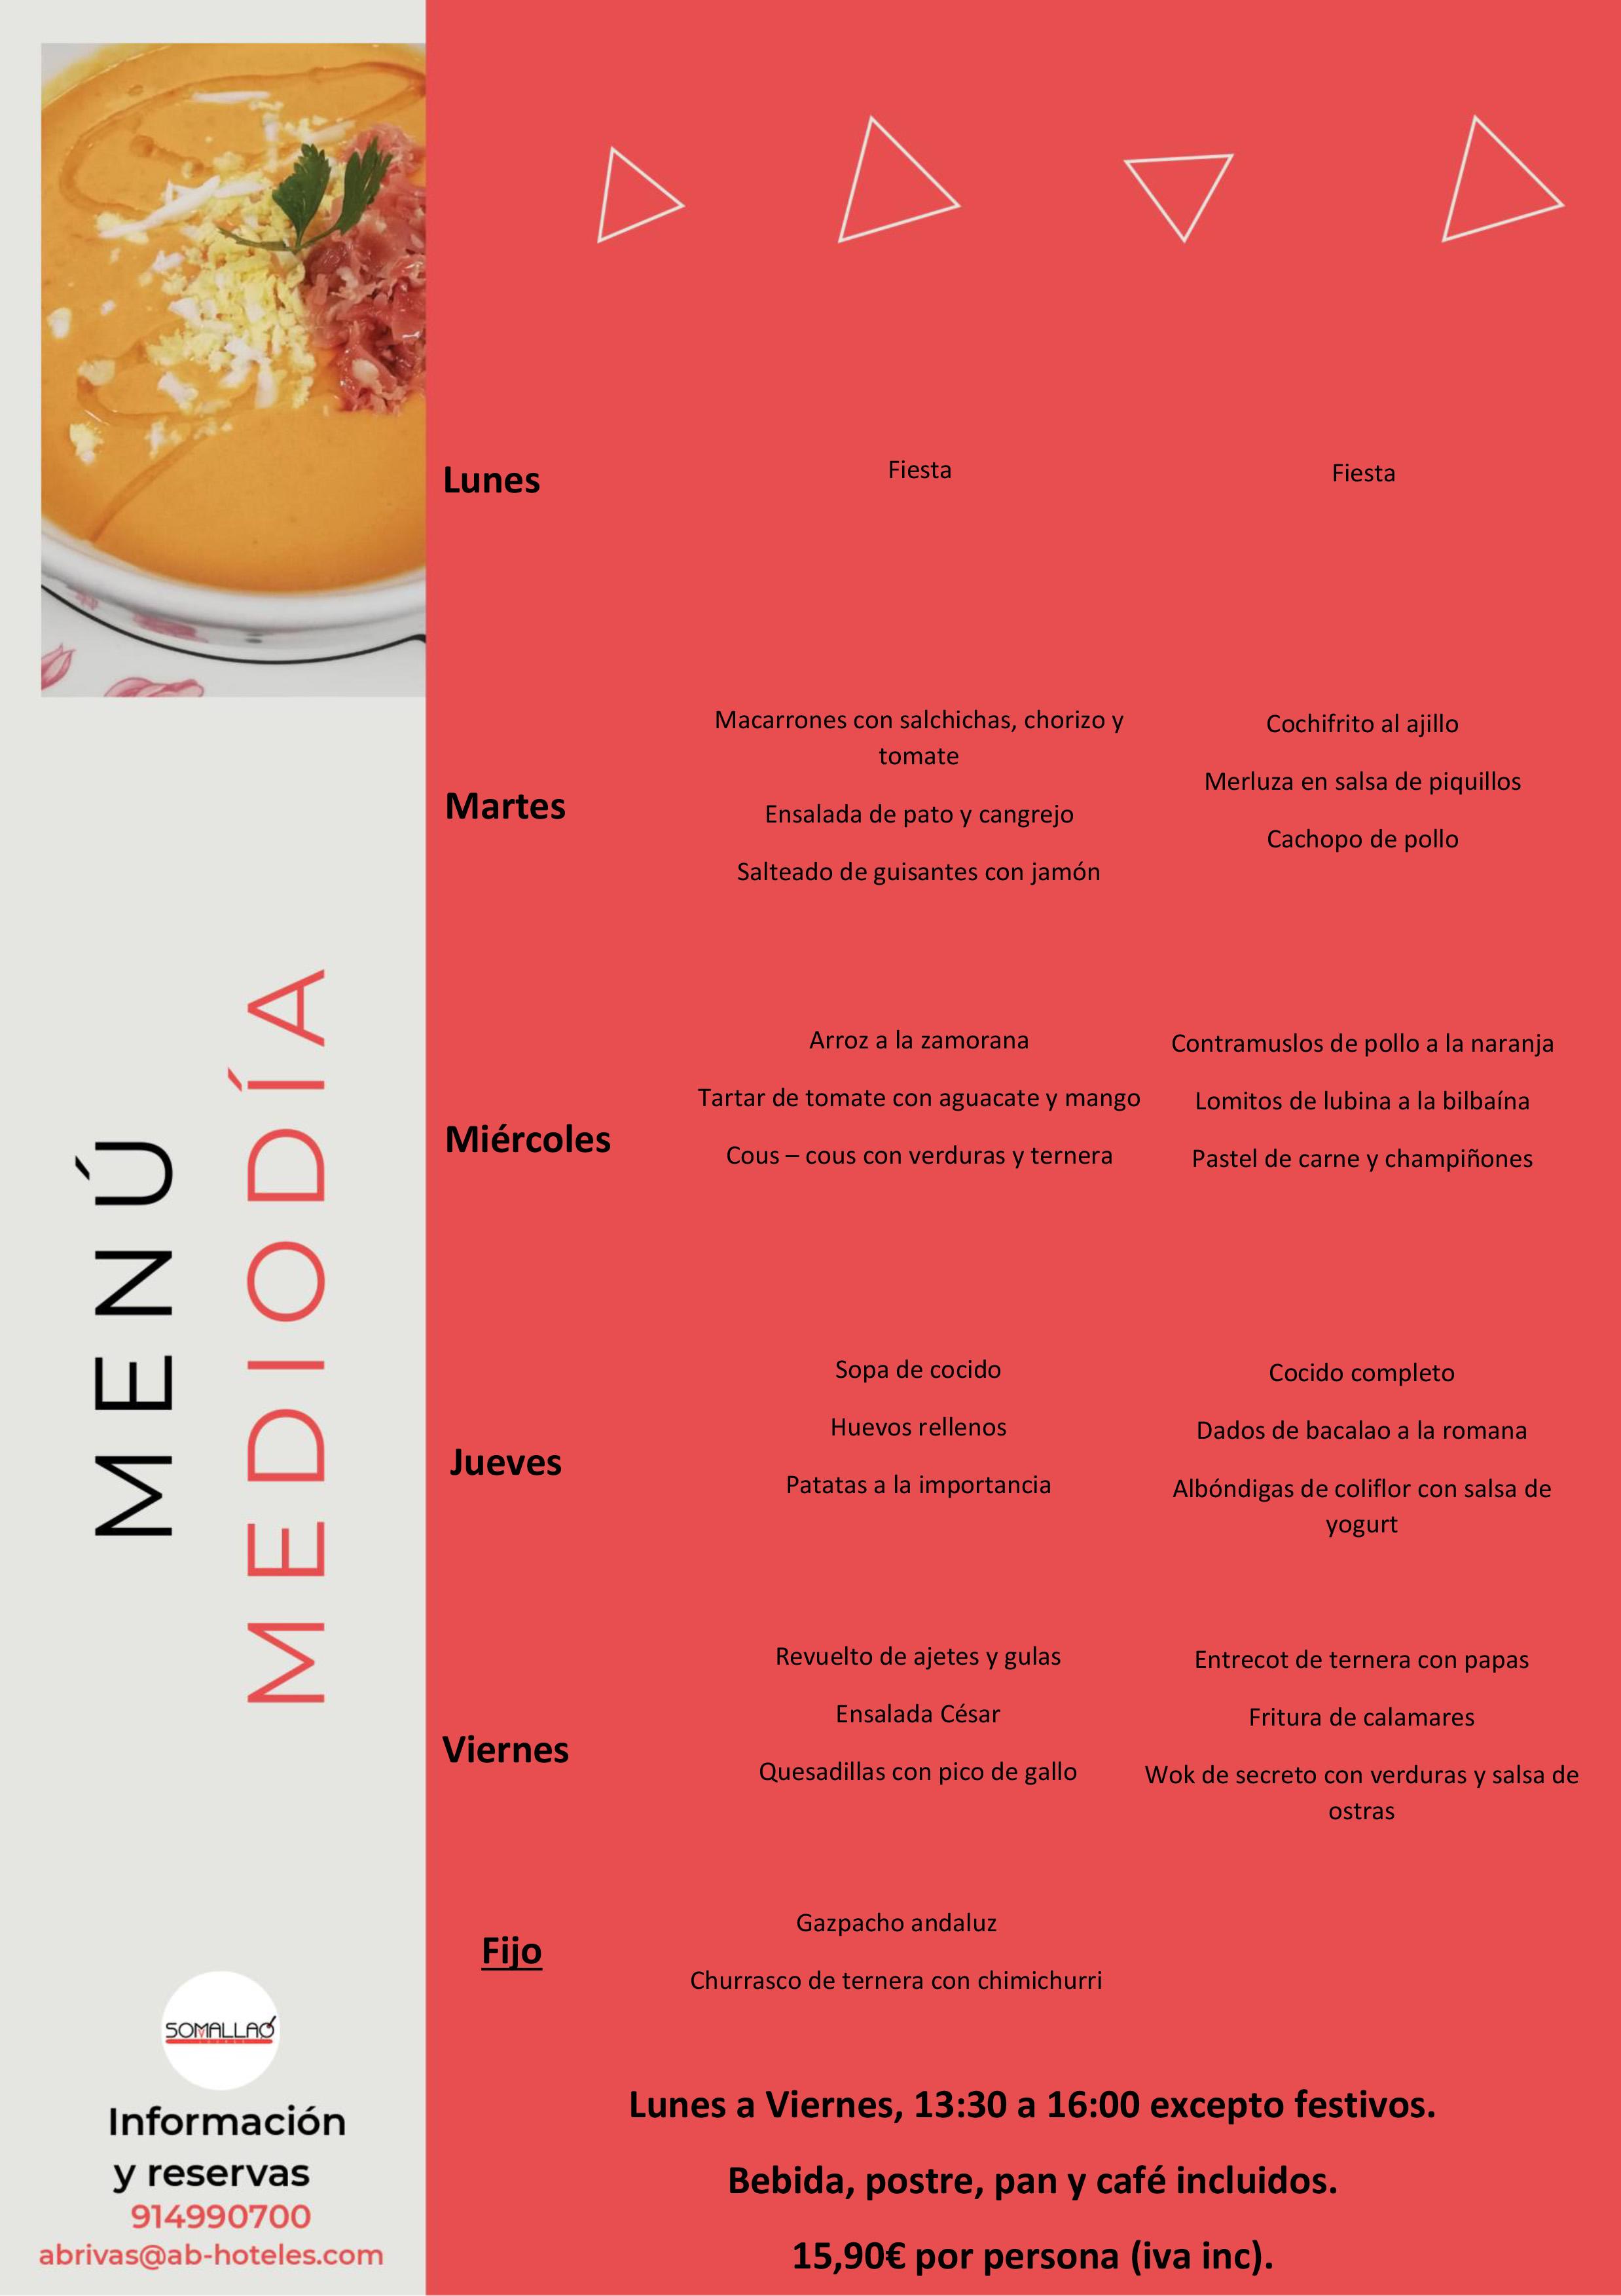 Restaurante Somallao Rivas Menú de la semana 3 al 7 de Mayo de 2021.jpg